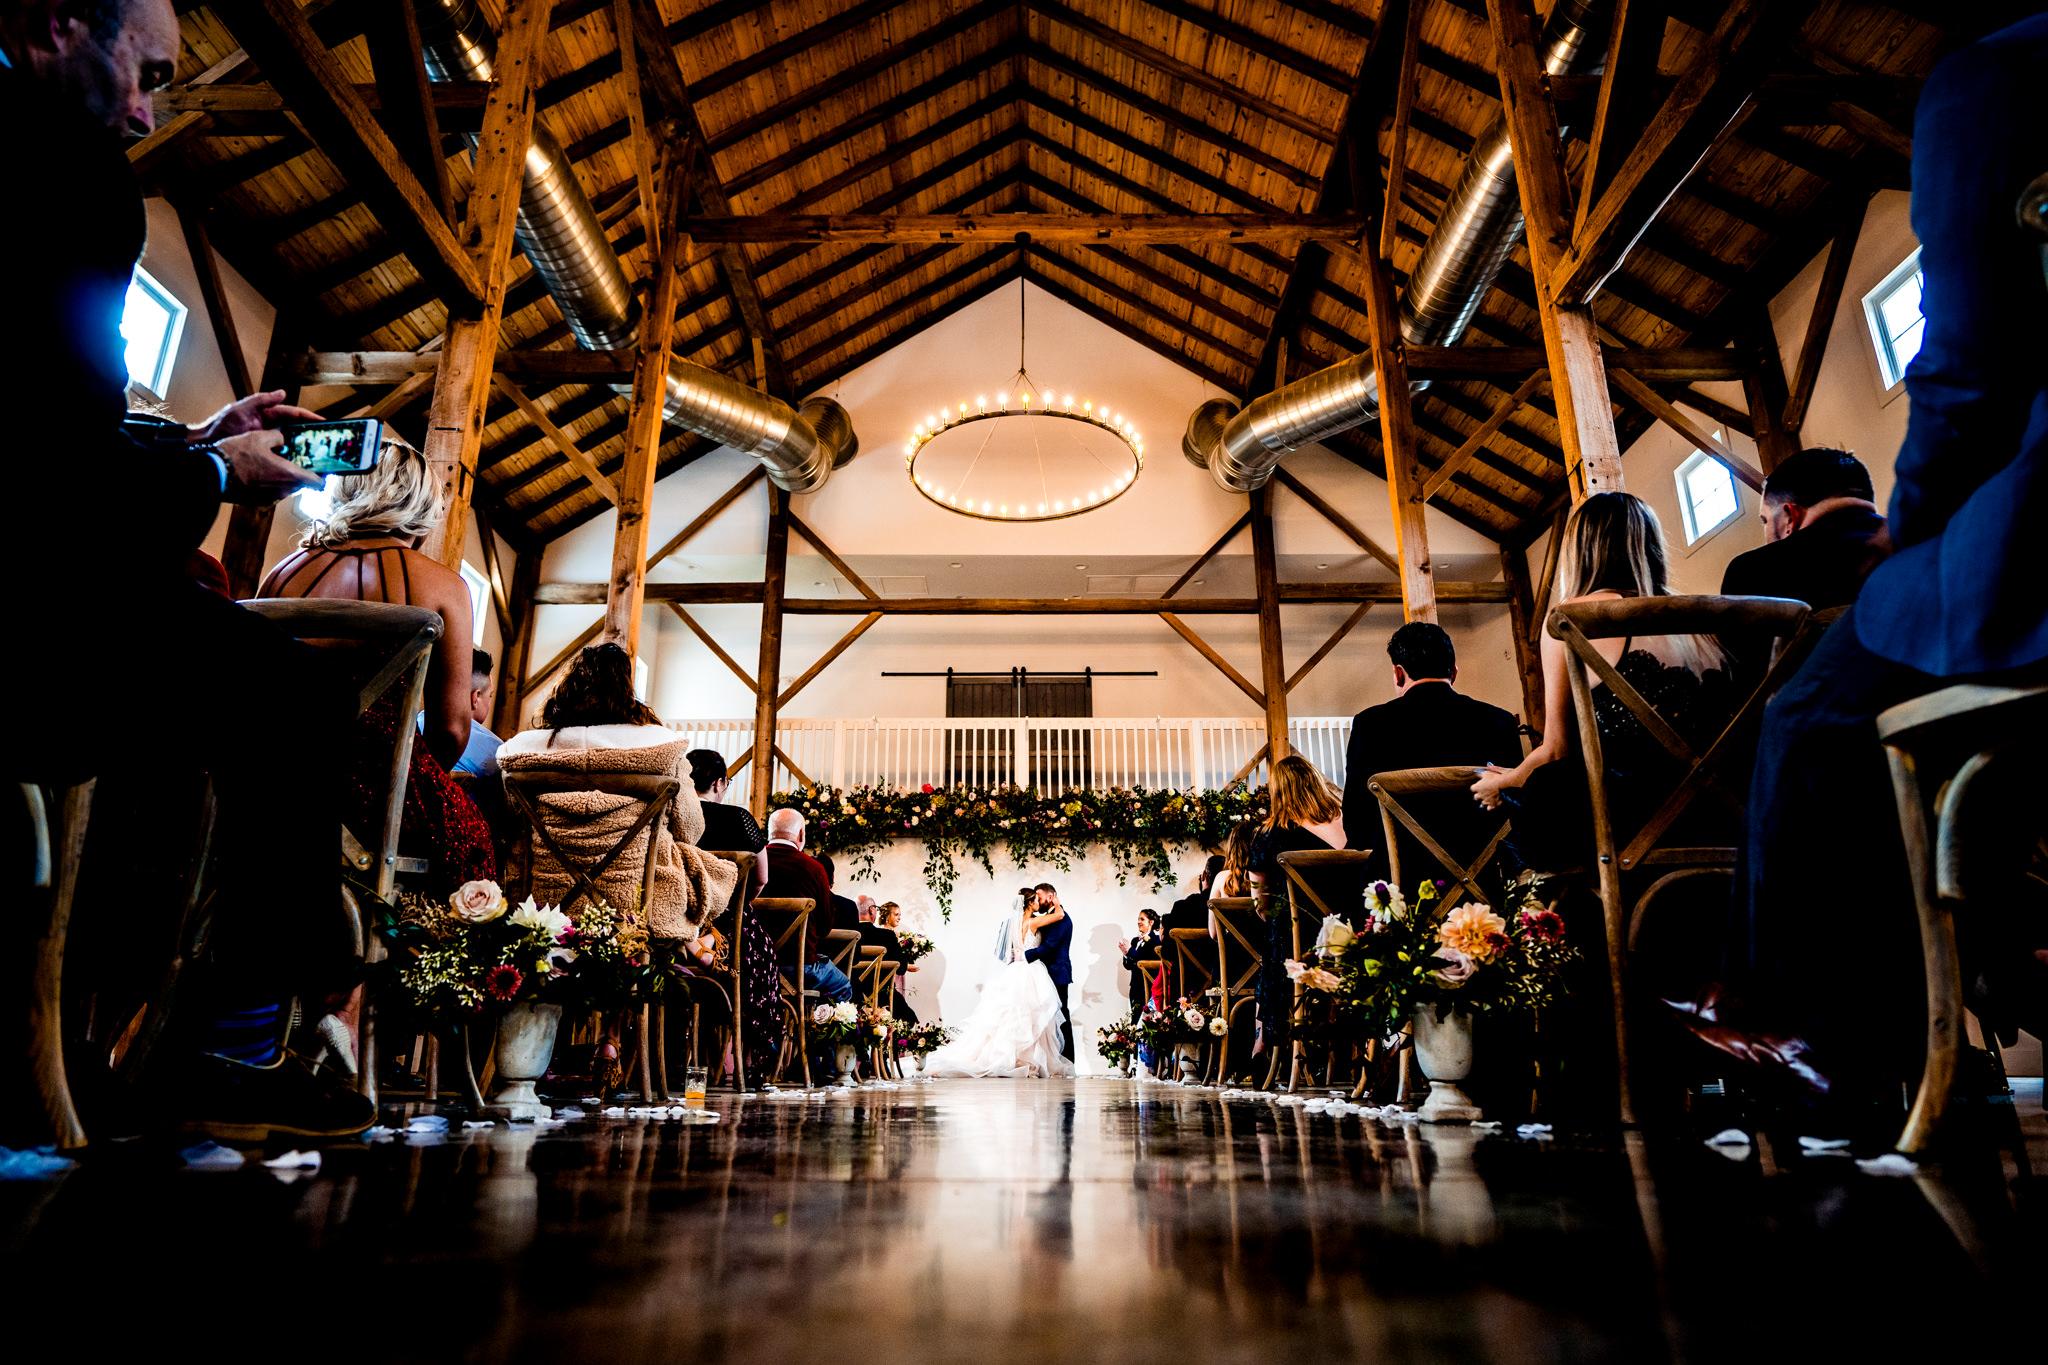 Emily&Ron-Chapel-hill-wedding-barn-36.jpg